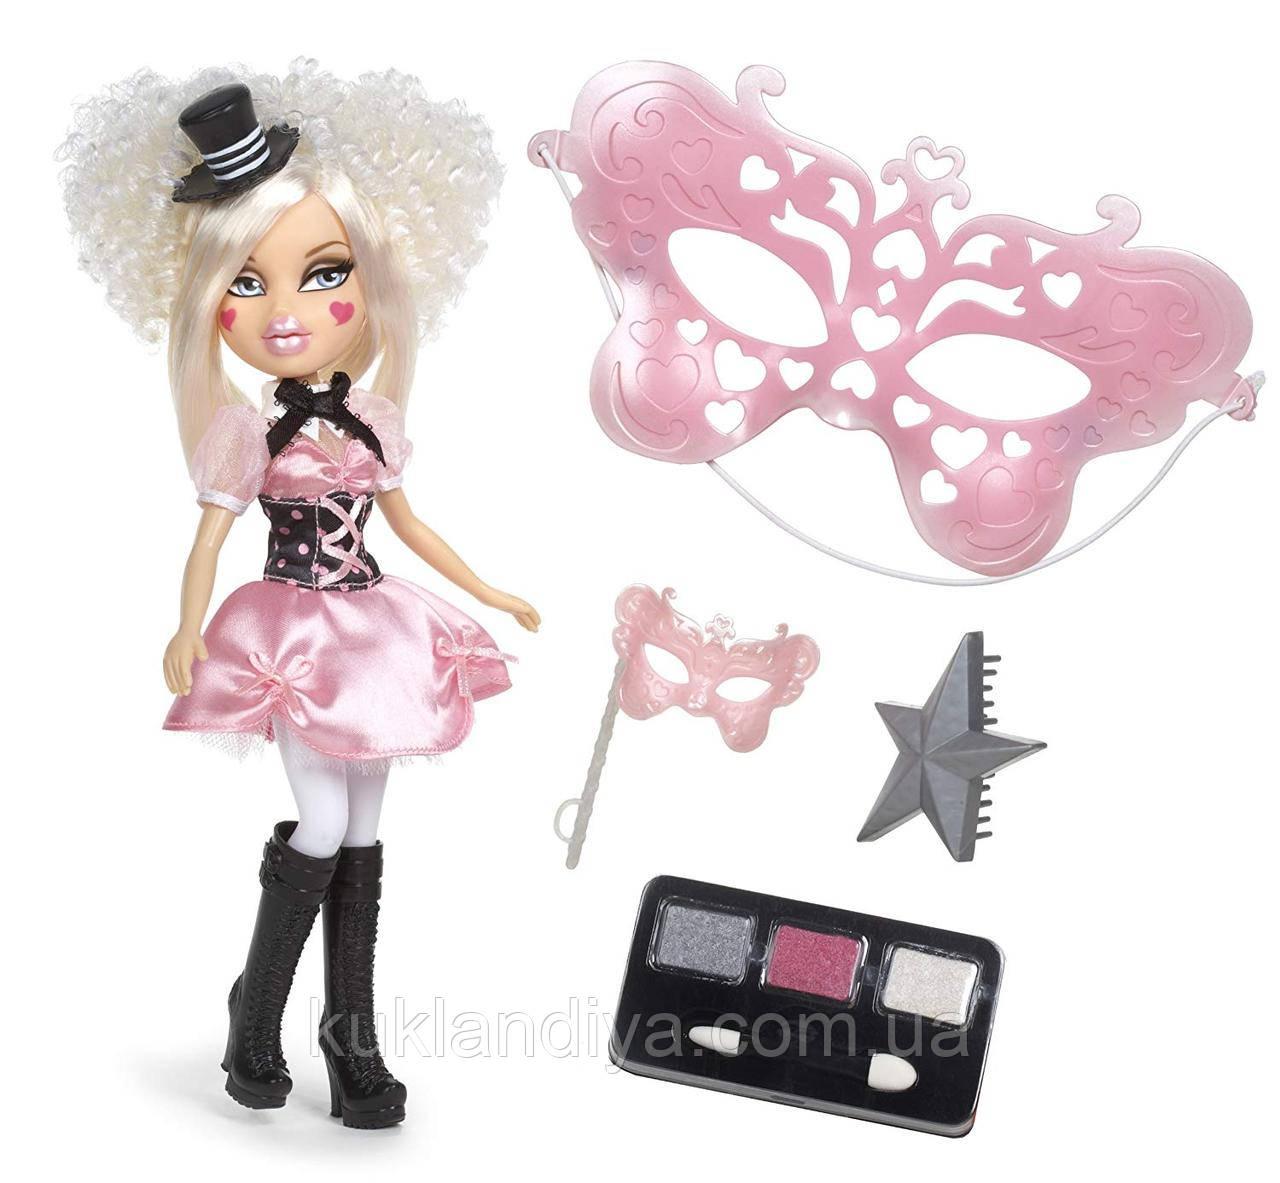 Кукла Bratz  Маскарад чайная вечеринка принцесс Brielle